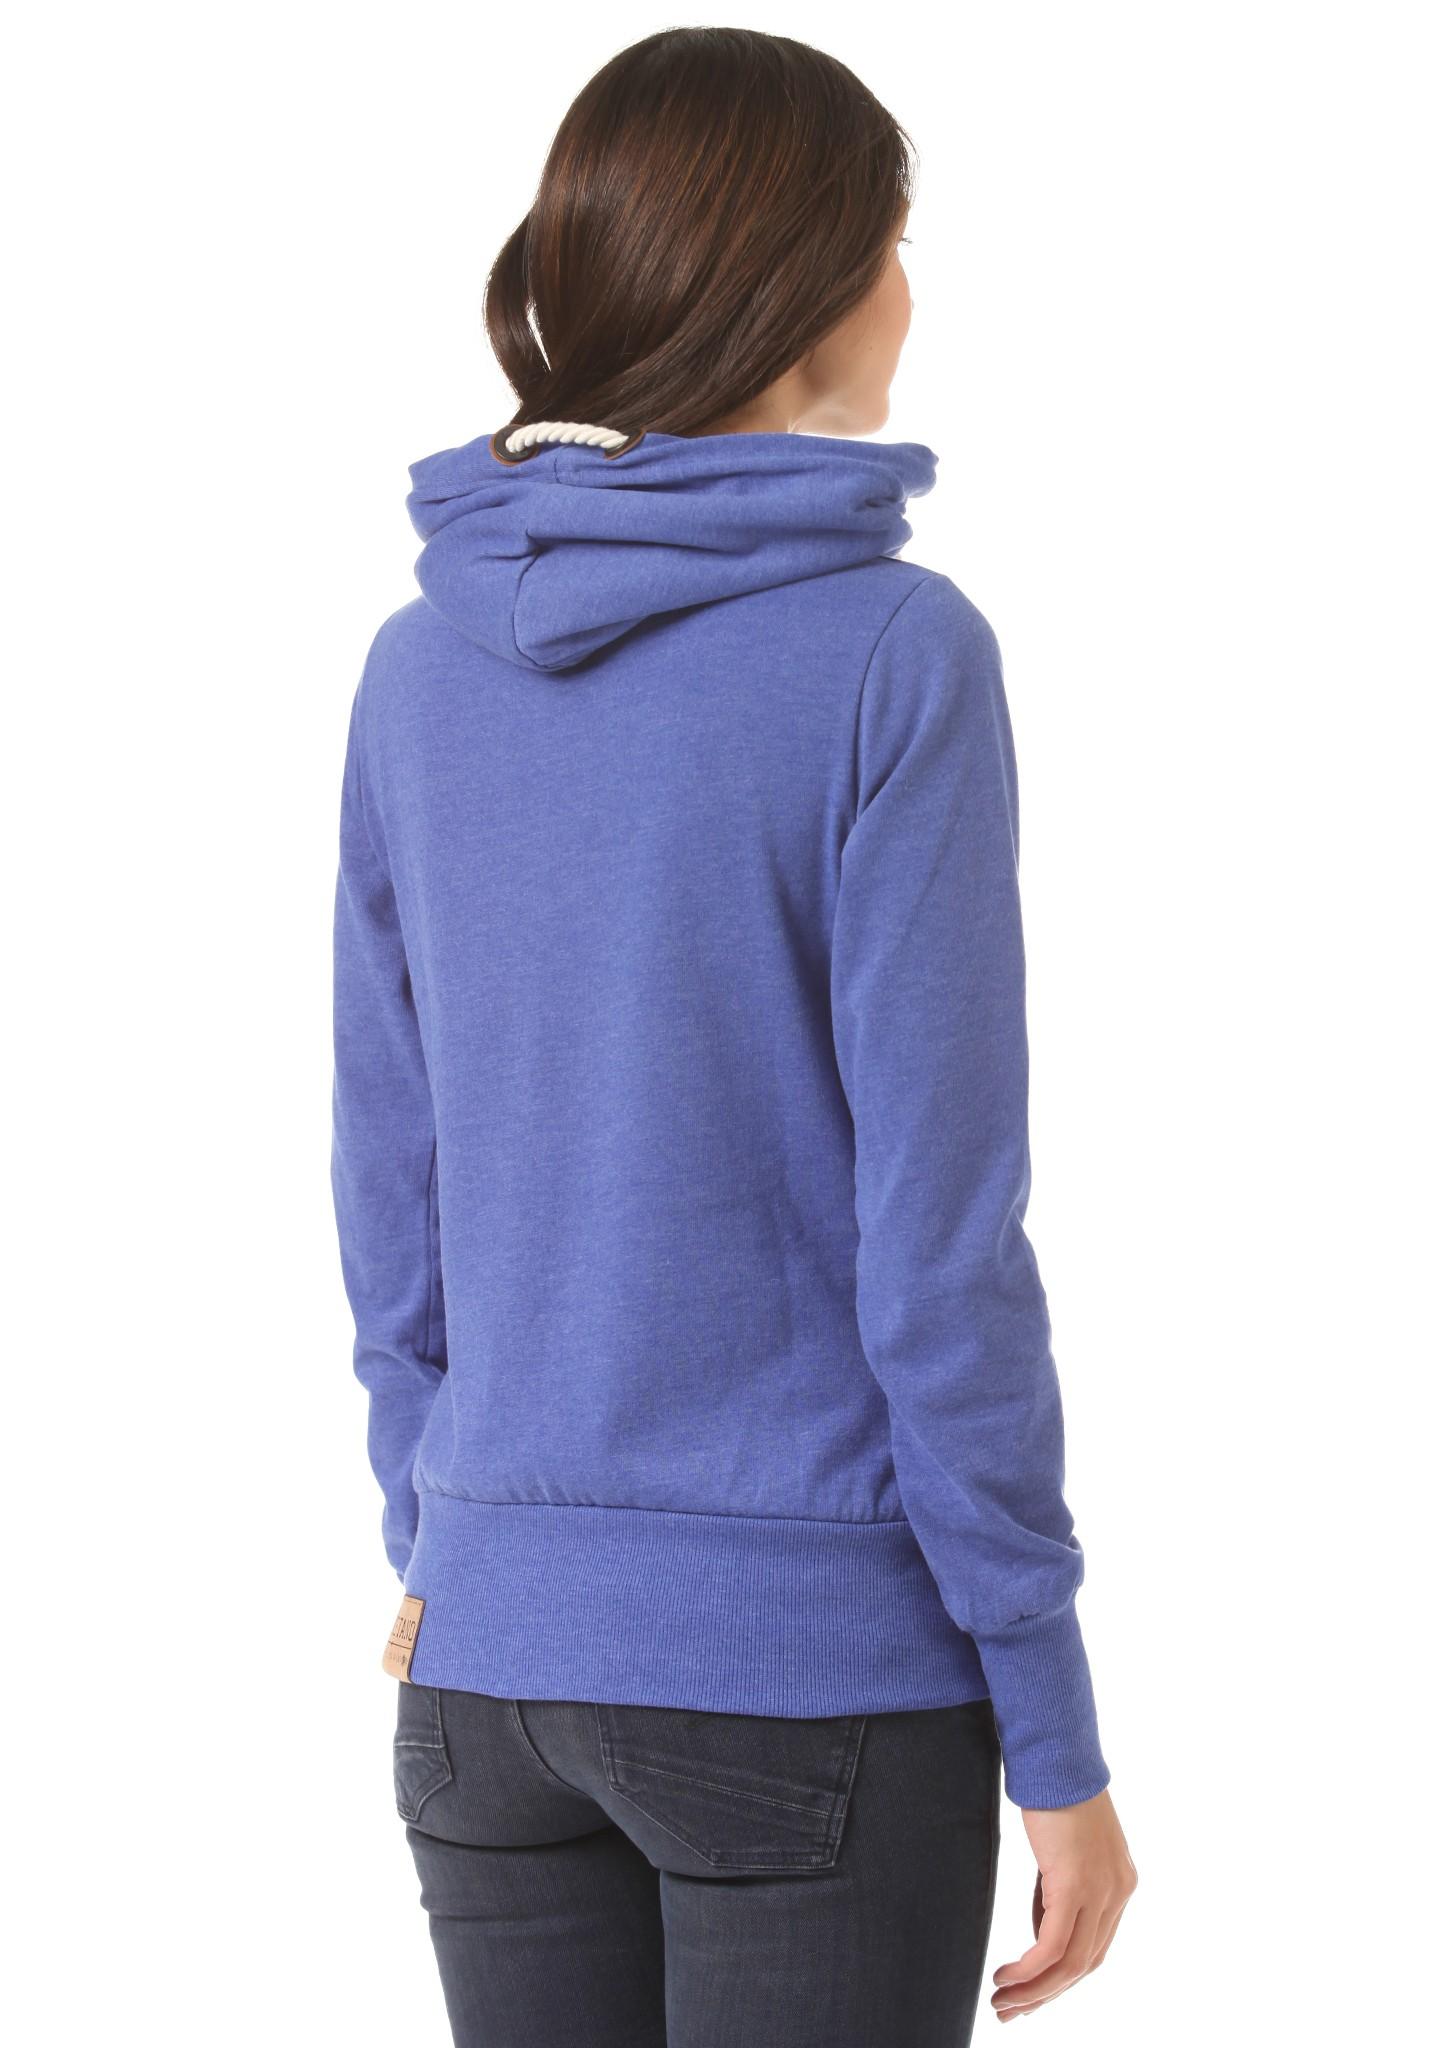 neu naketano bubbelmaul damen kapuzenpullover pullover hoodie kapuzenjacke ebay. Black Bedroom Furniture Sets. Home Design Ideas